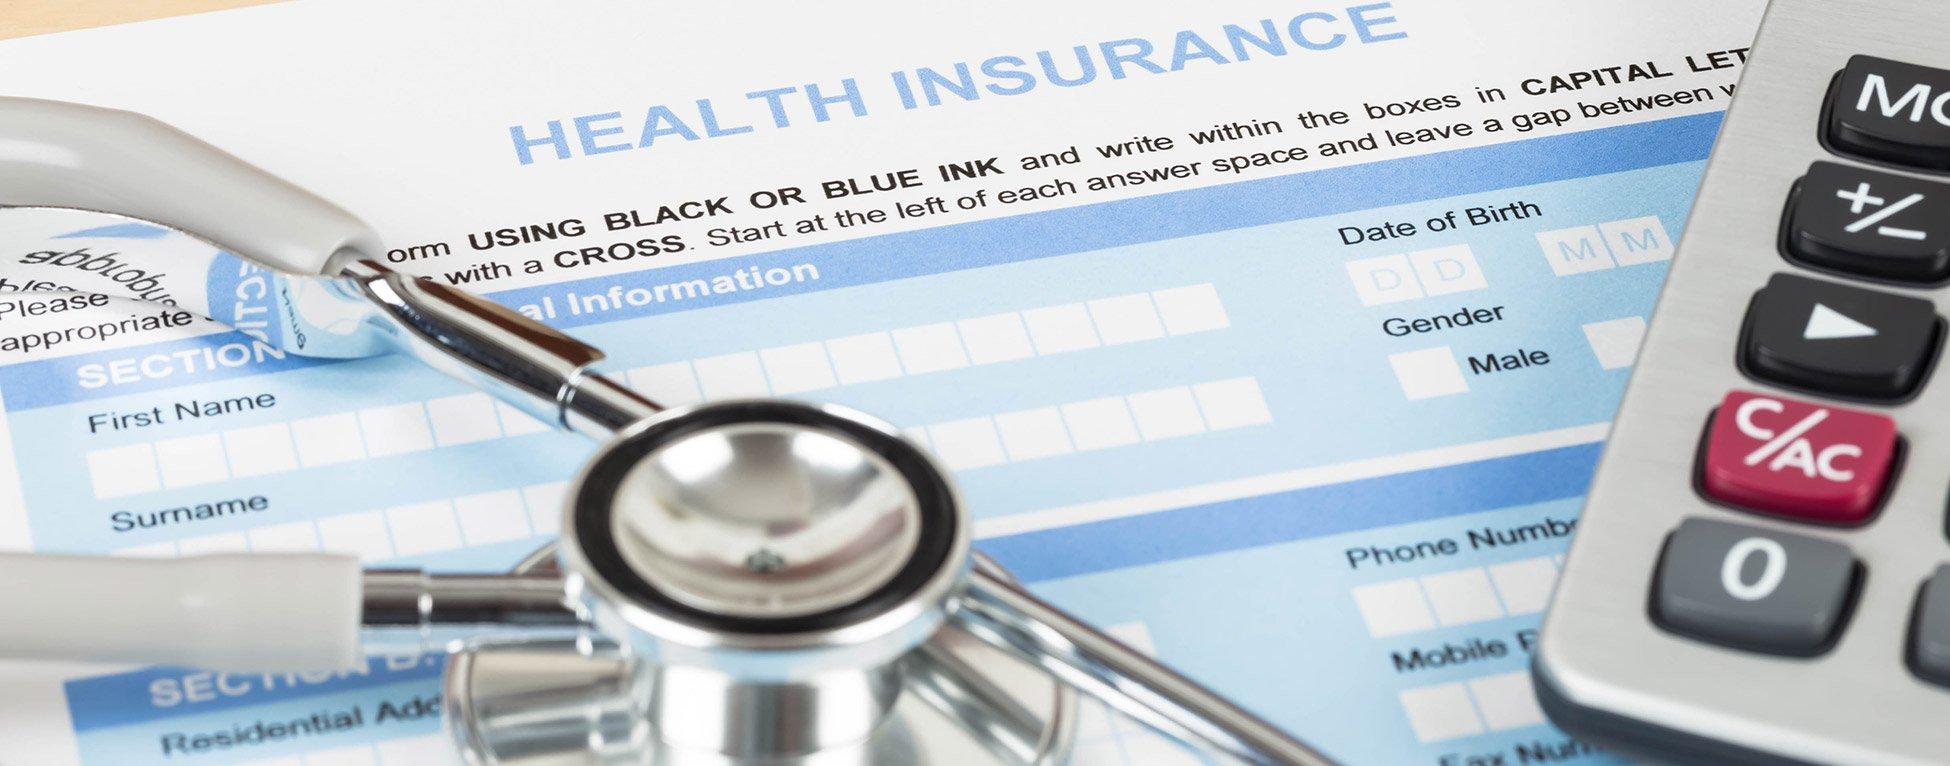 Health Insurance Acceptance Form Precision Medical Provo